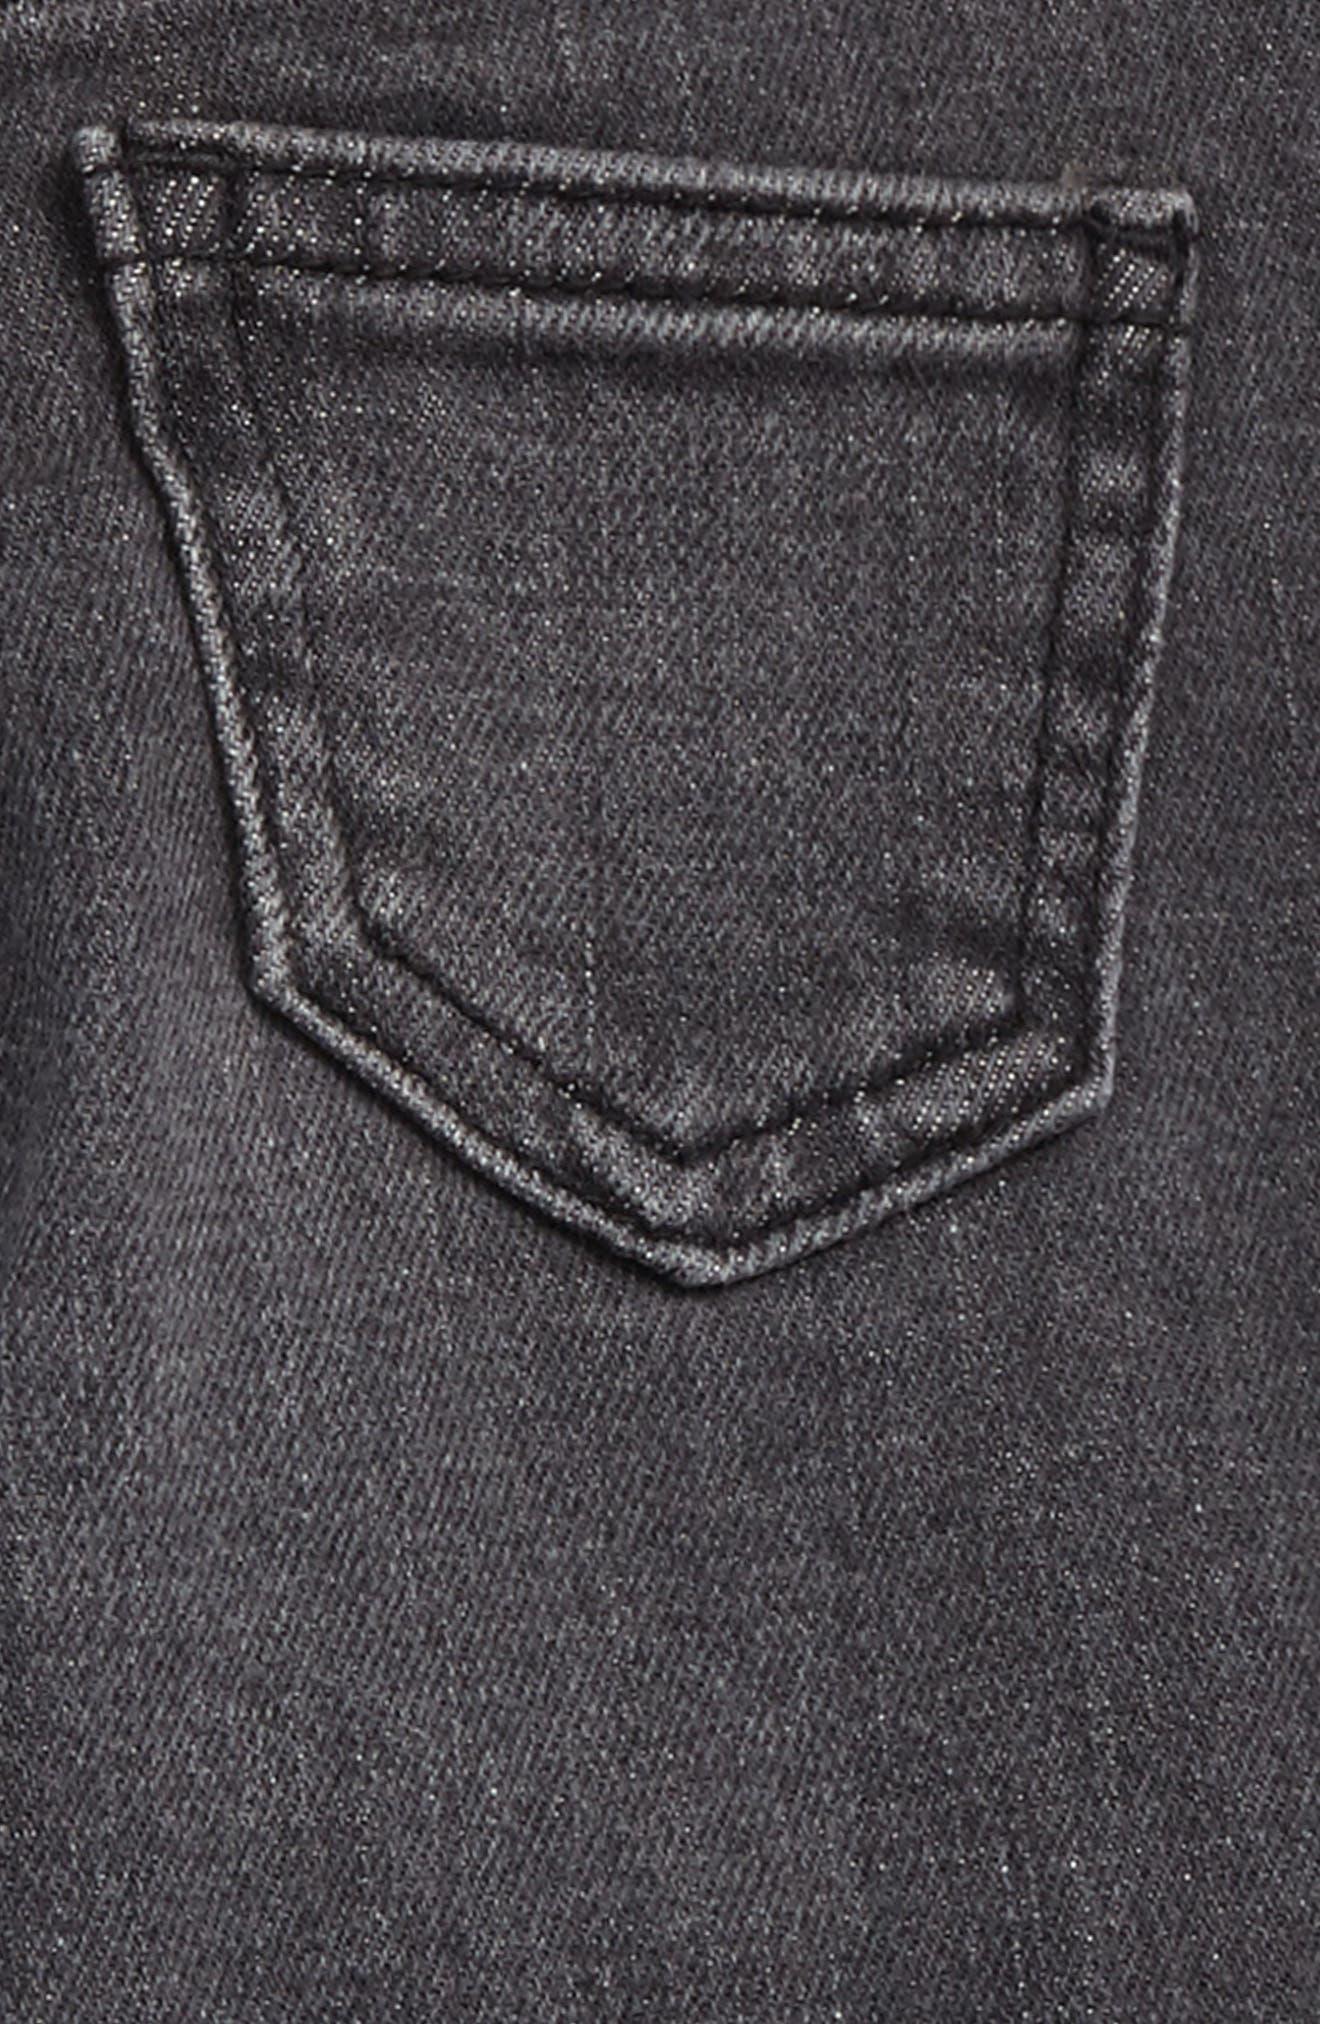 Sasha Skinny Jeans,                             Alternate thumbnail 3, color,                             Grey